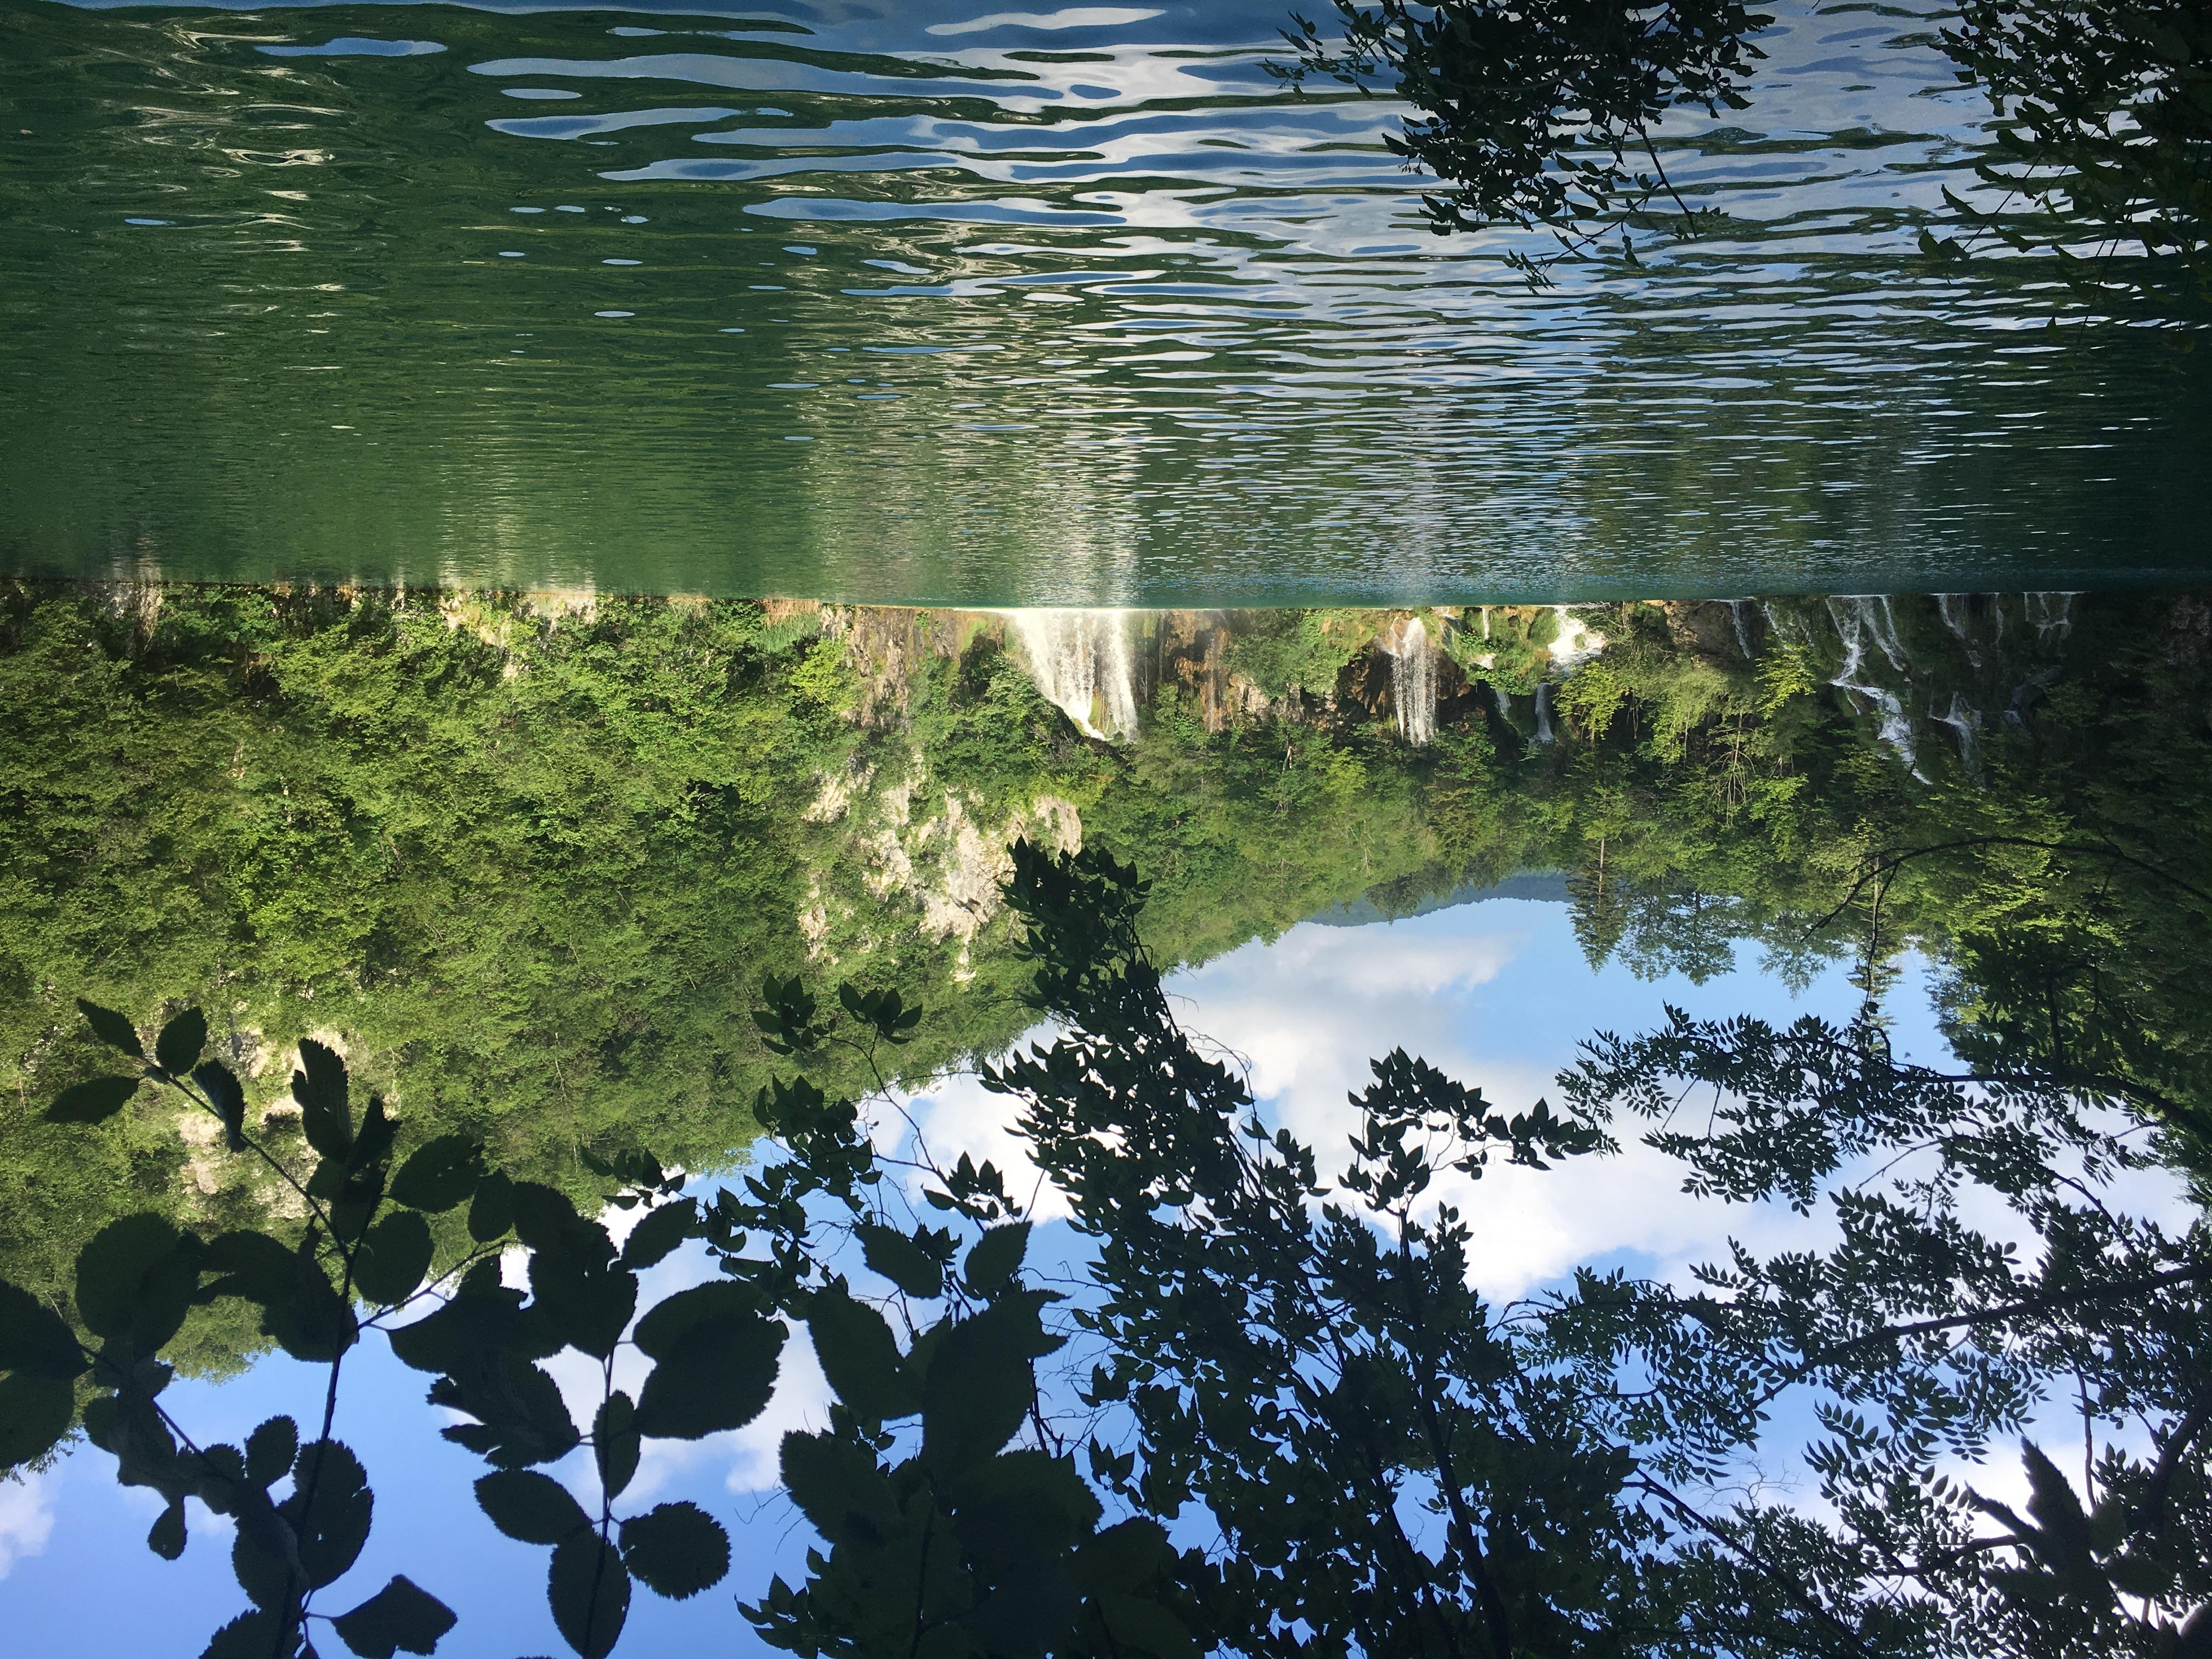 Plitvicer See